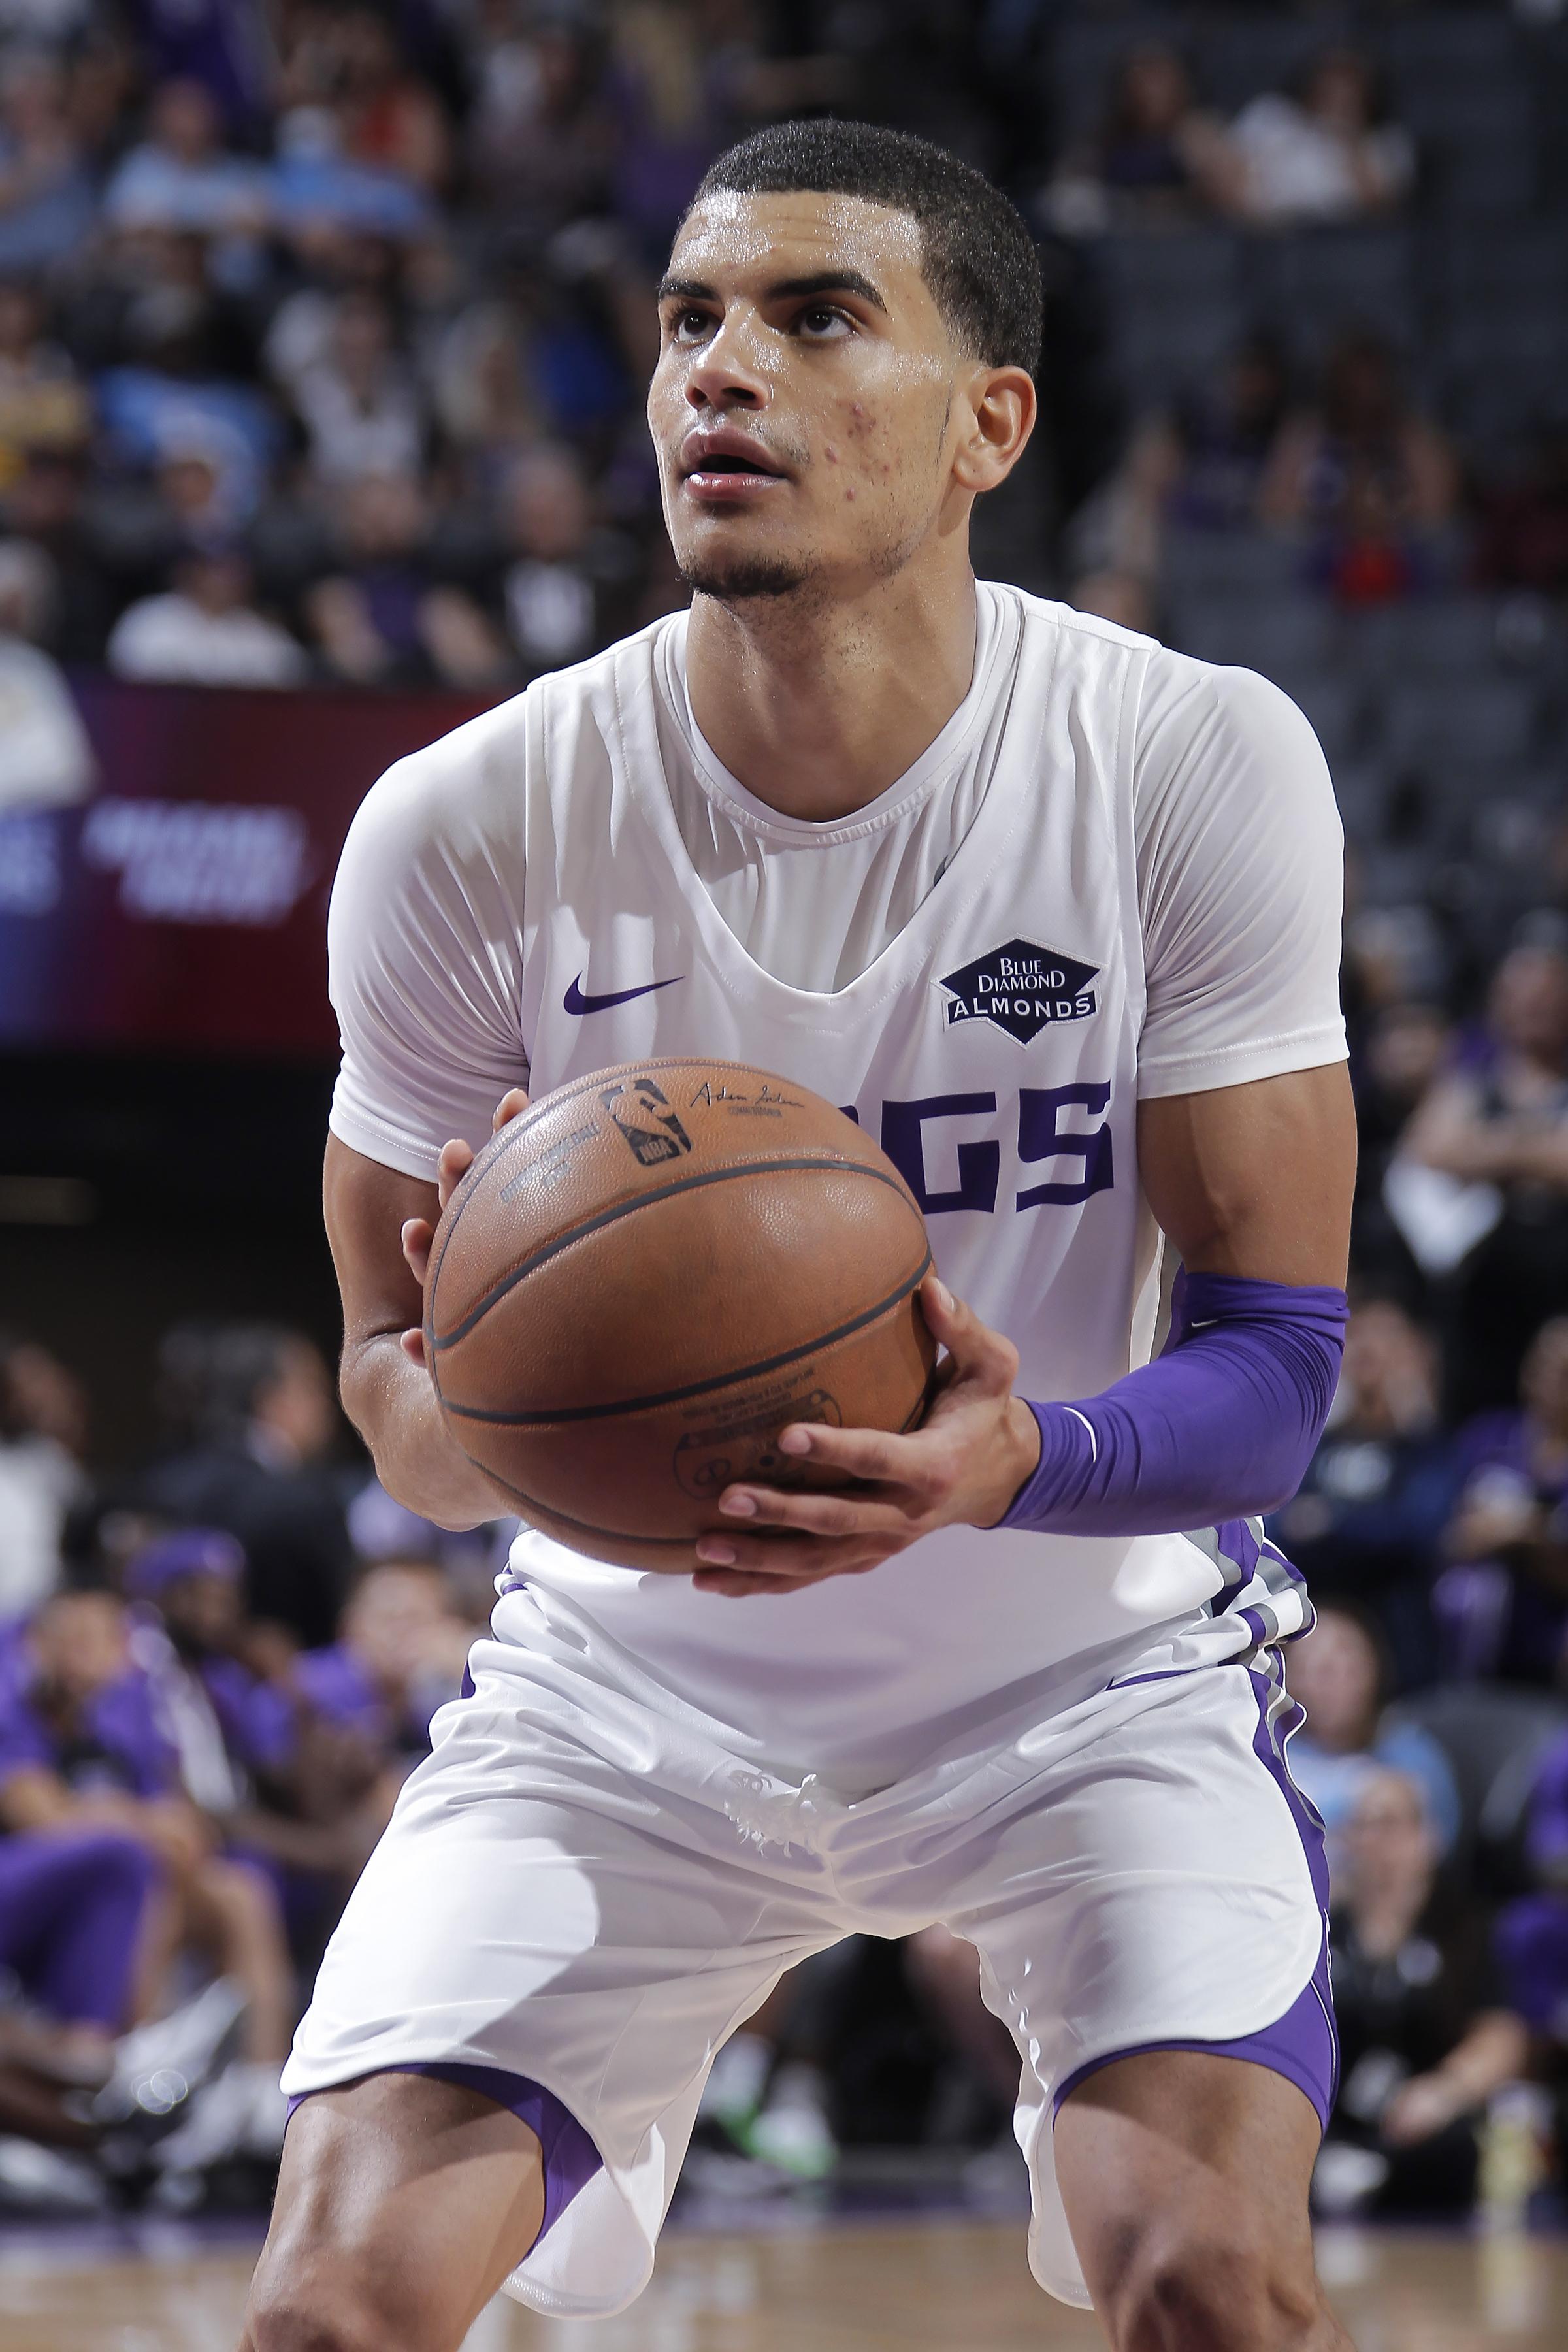 2019 California Classic - Golden State Warriors v Sacramento Kings